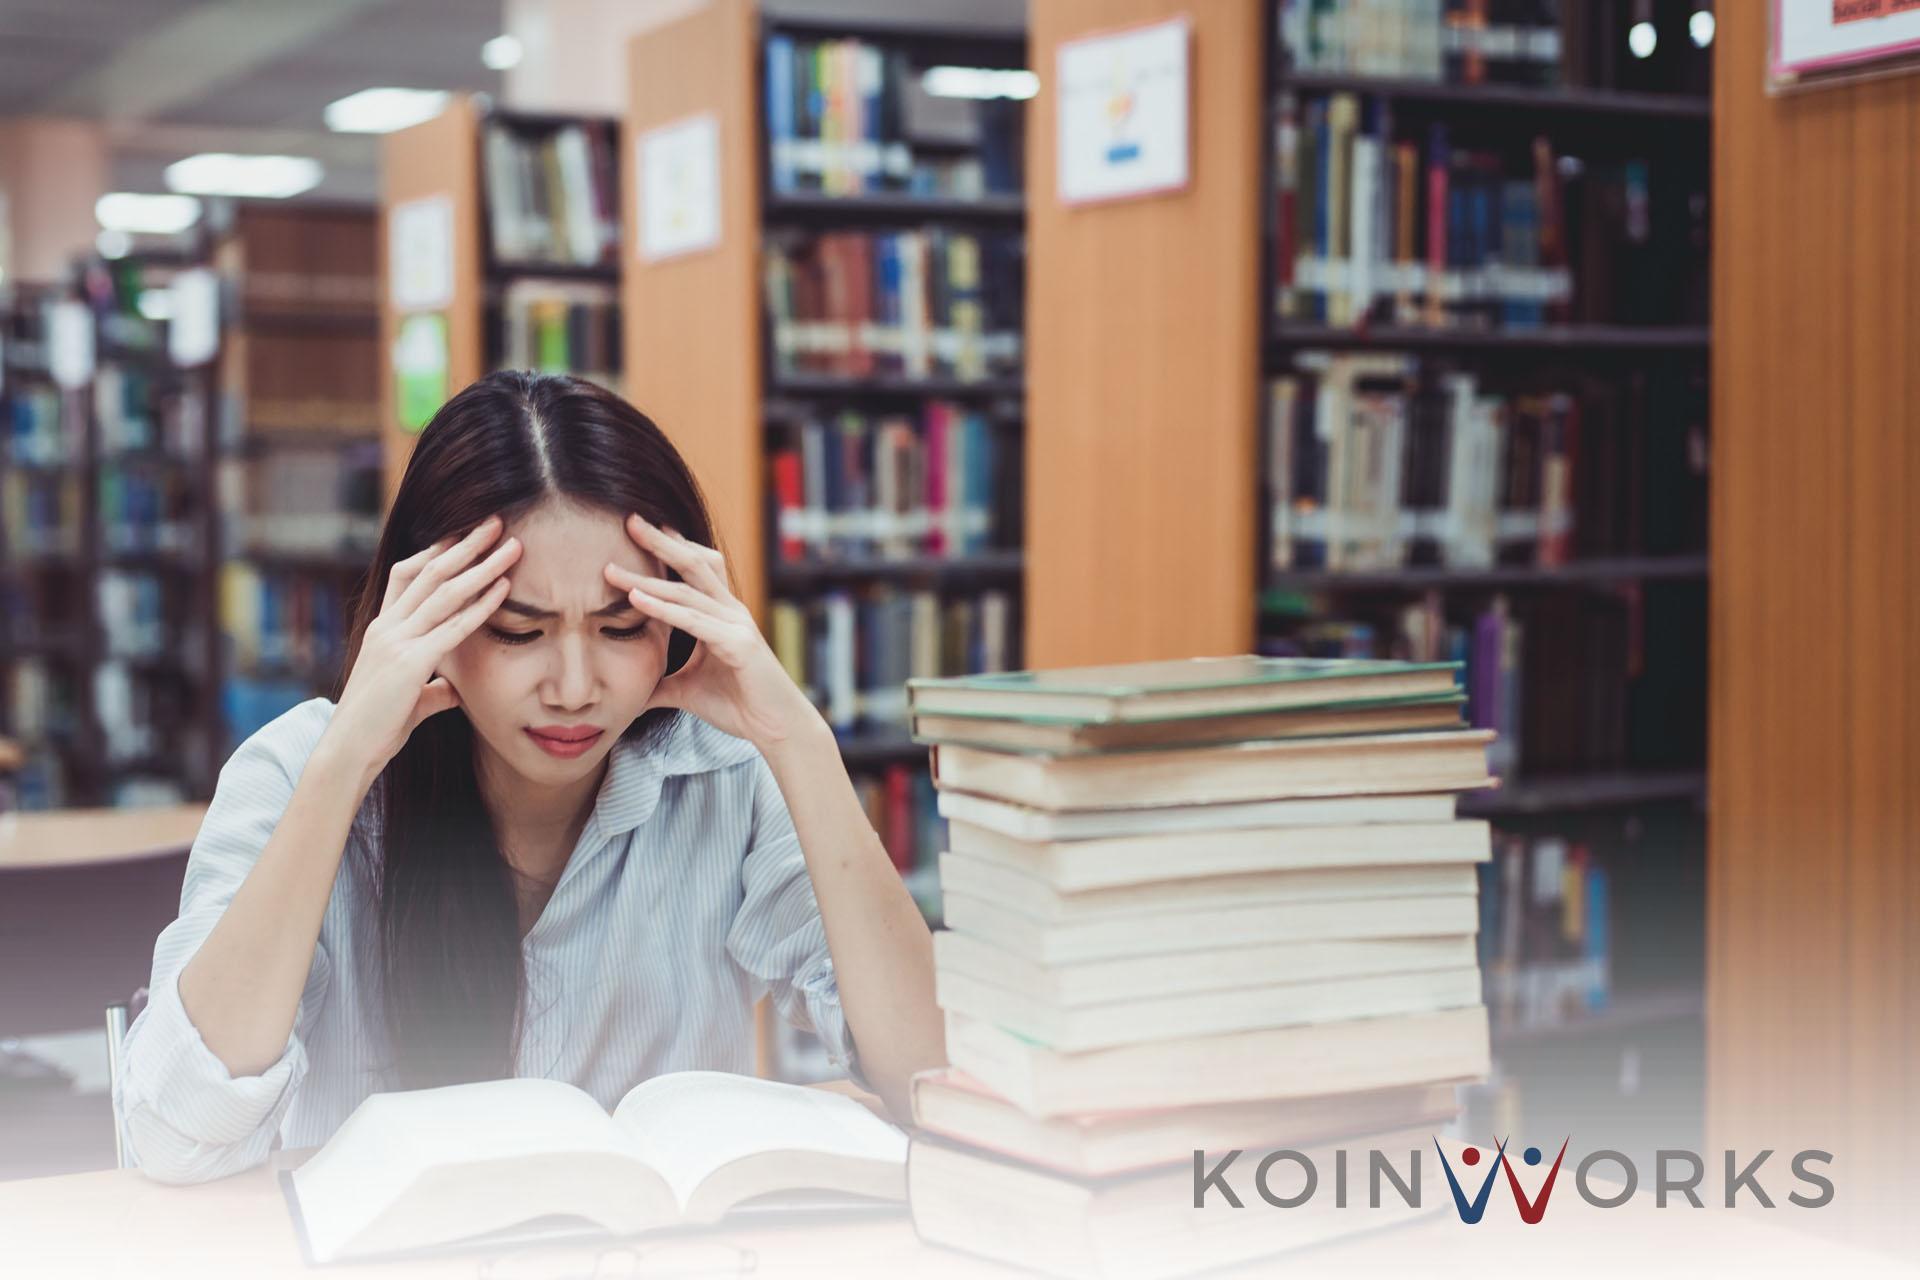 4 Trik Mudah agar Anda Rajin Belajar Setiap Hari (25) - 5 Alasan Mengapa Produktivitas Menurun, Ubah Kebiasaan dan Jadi Lebih Baik! - 4 Cara Mengatasi Stres dan Kecemasan dalam Proses Belajar